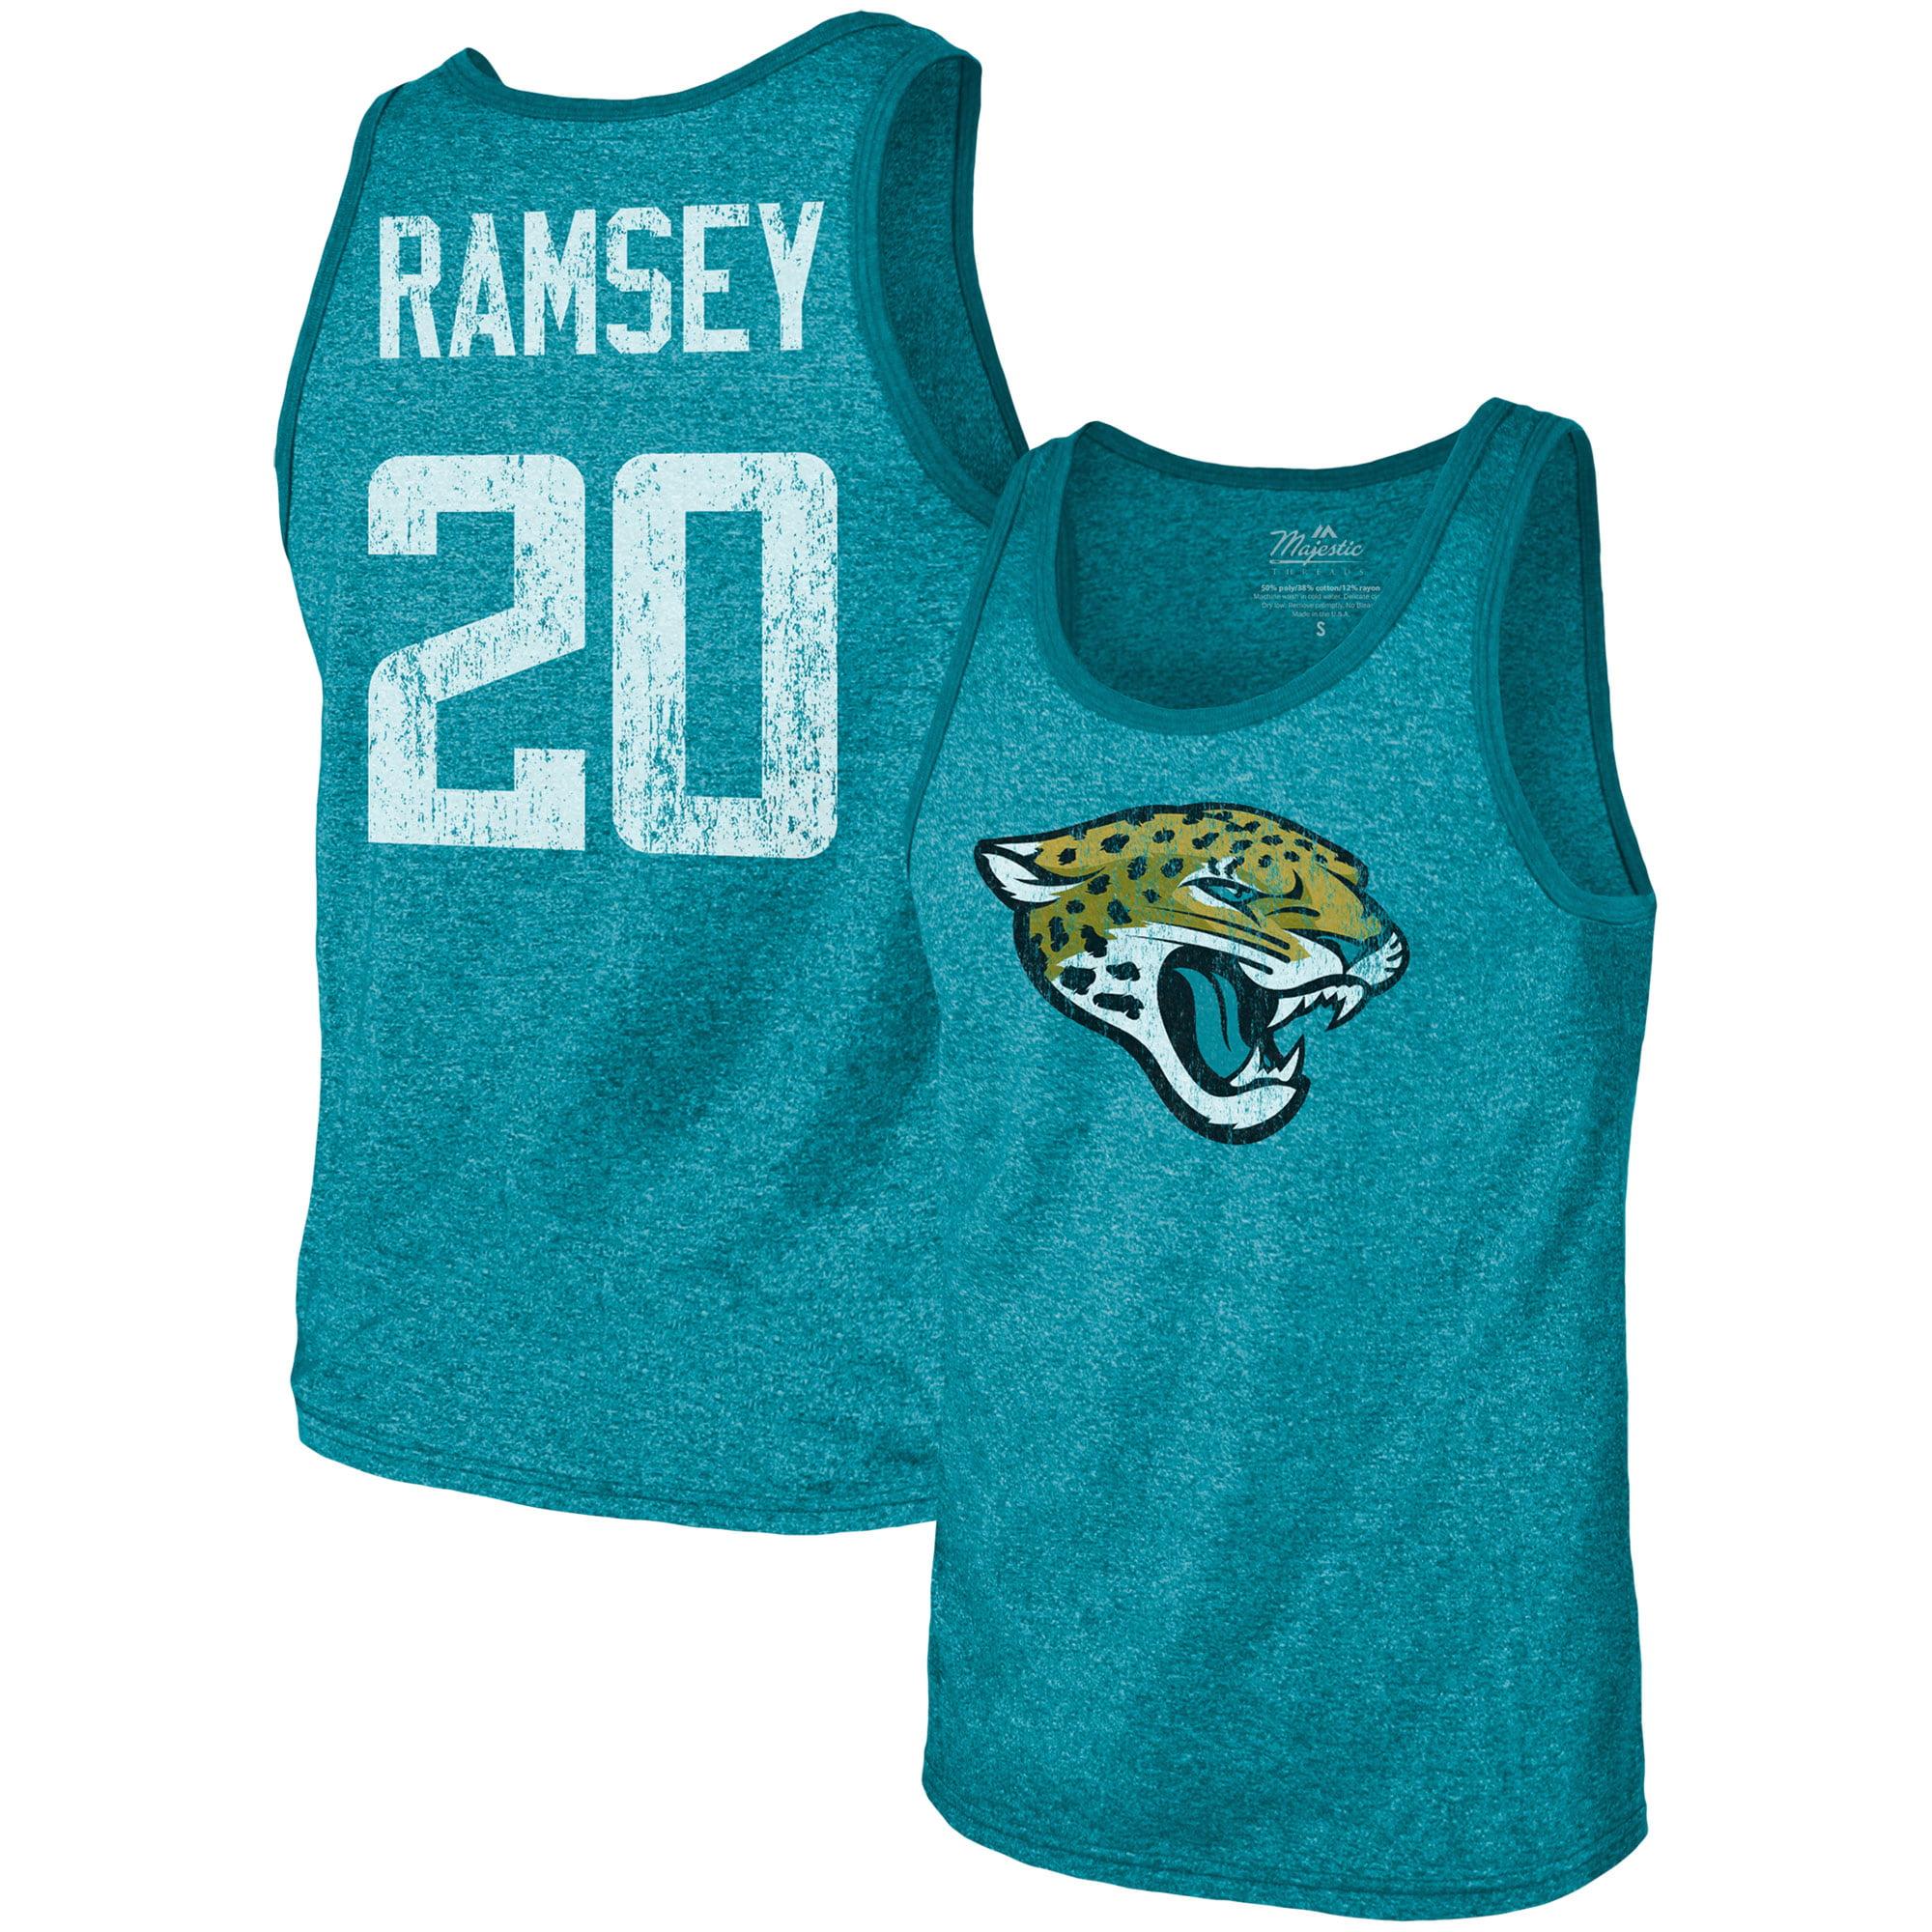 Jalen Ramsey Jacksonville Jaguars Majestic Threads Tri-Blend Name & Number Tank Top - Teal